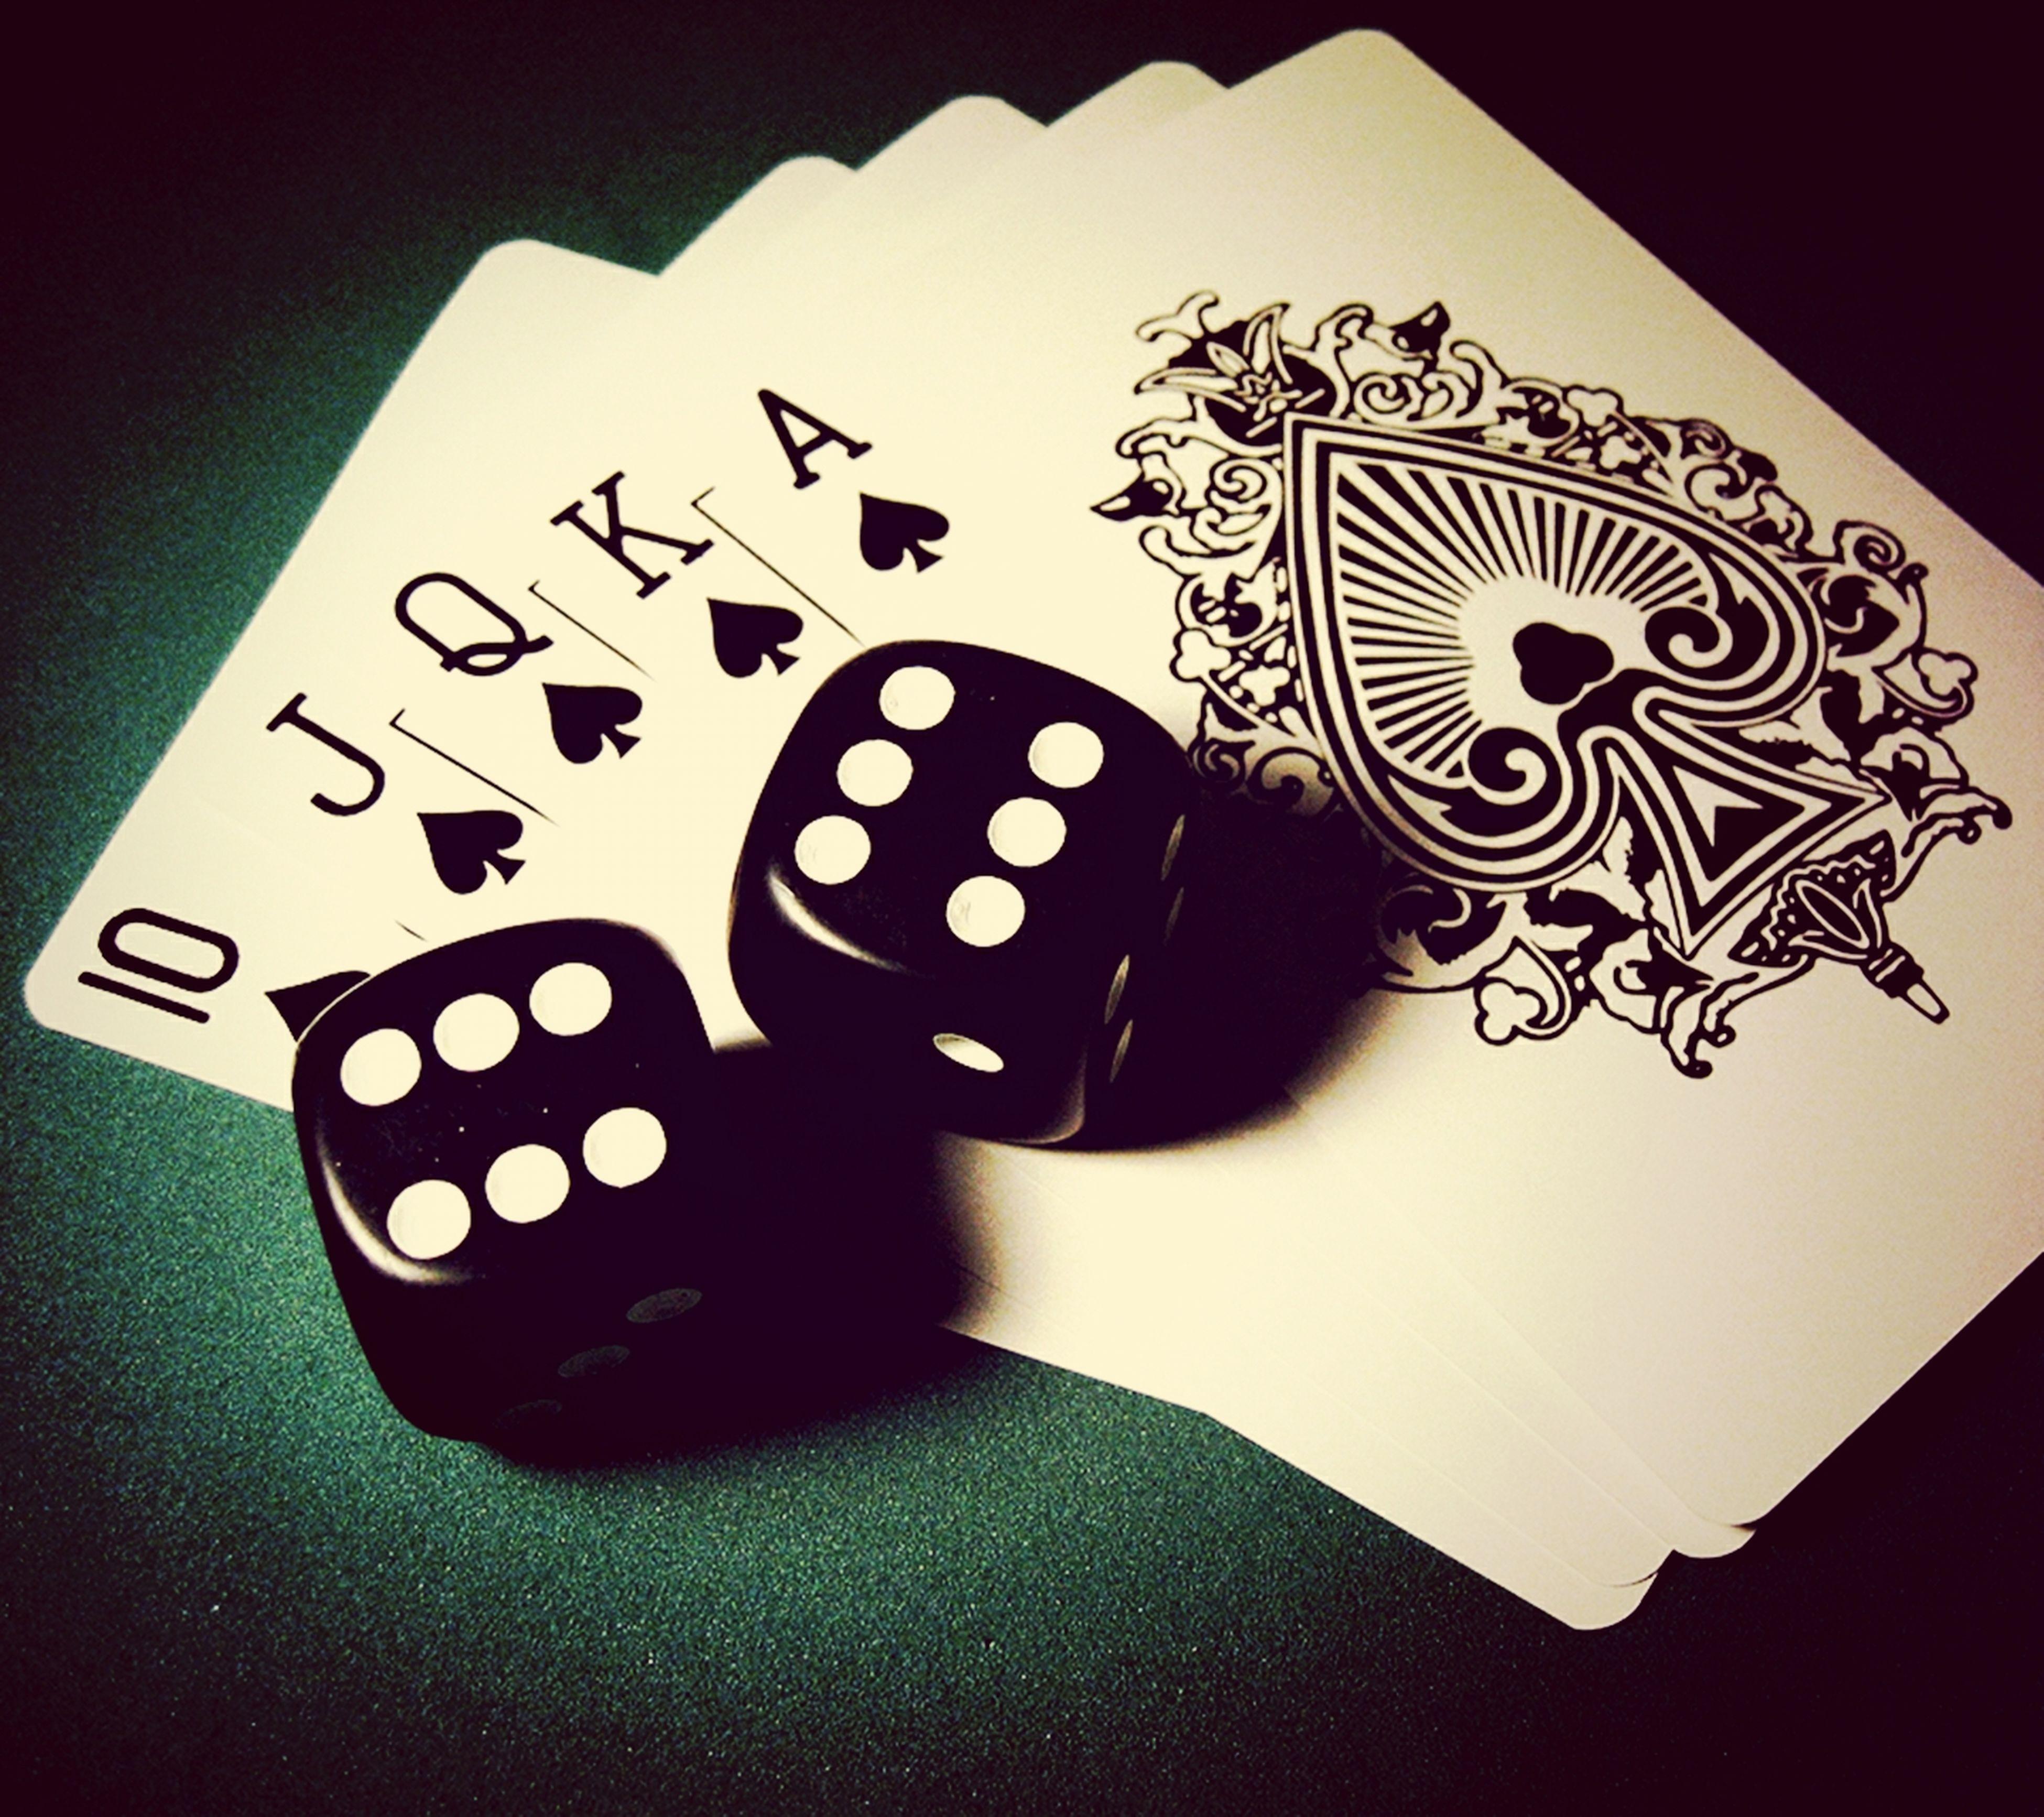 Jazz 🎺 & Gambling TheArtOfGambling Back To The Classics 🎩⌚